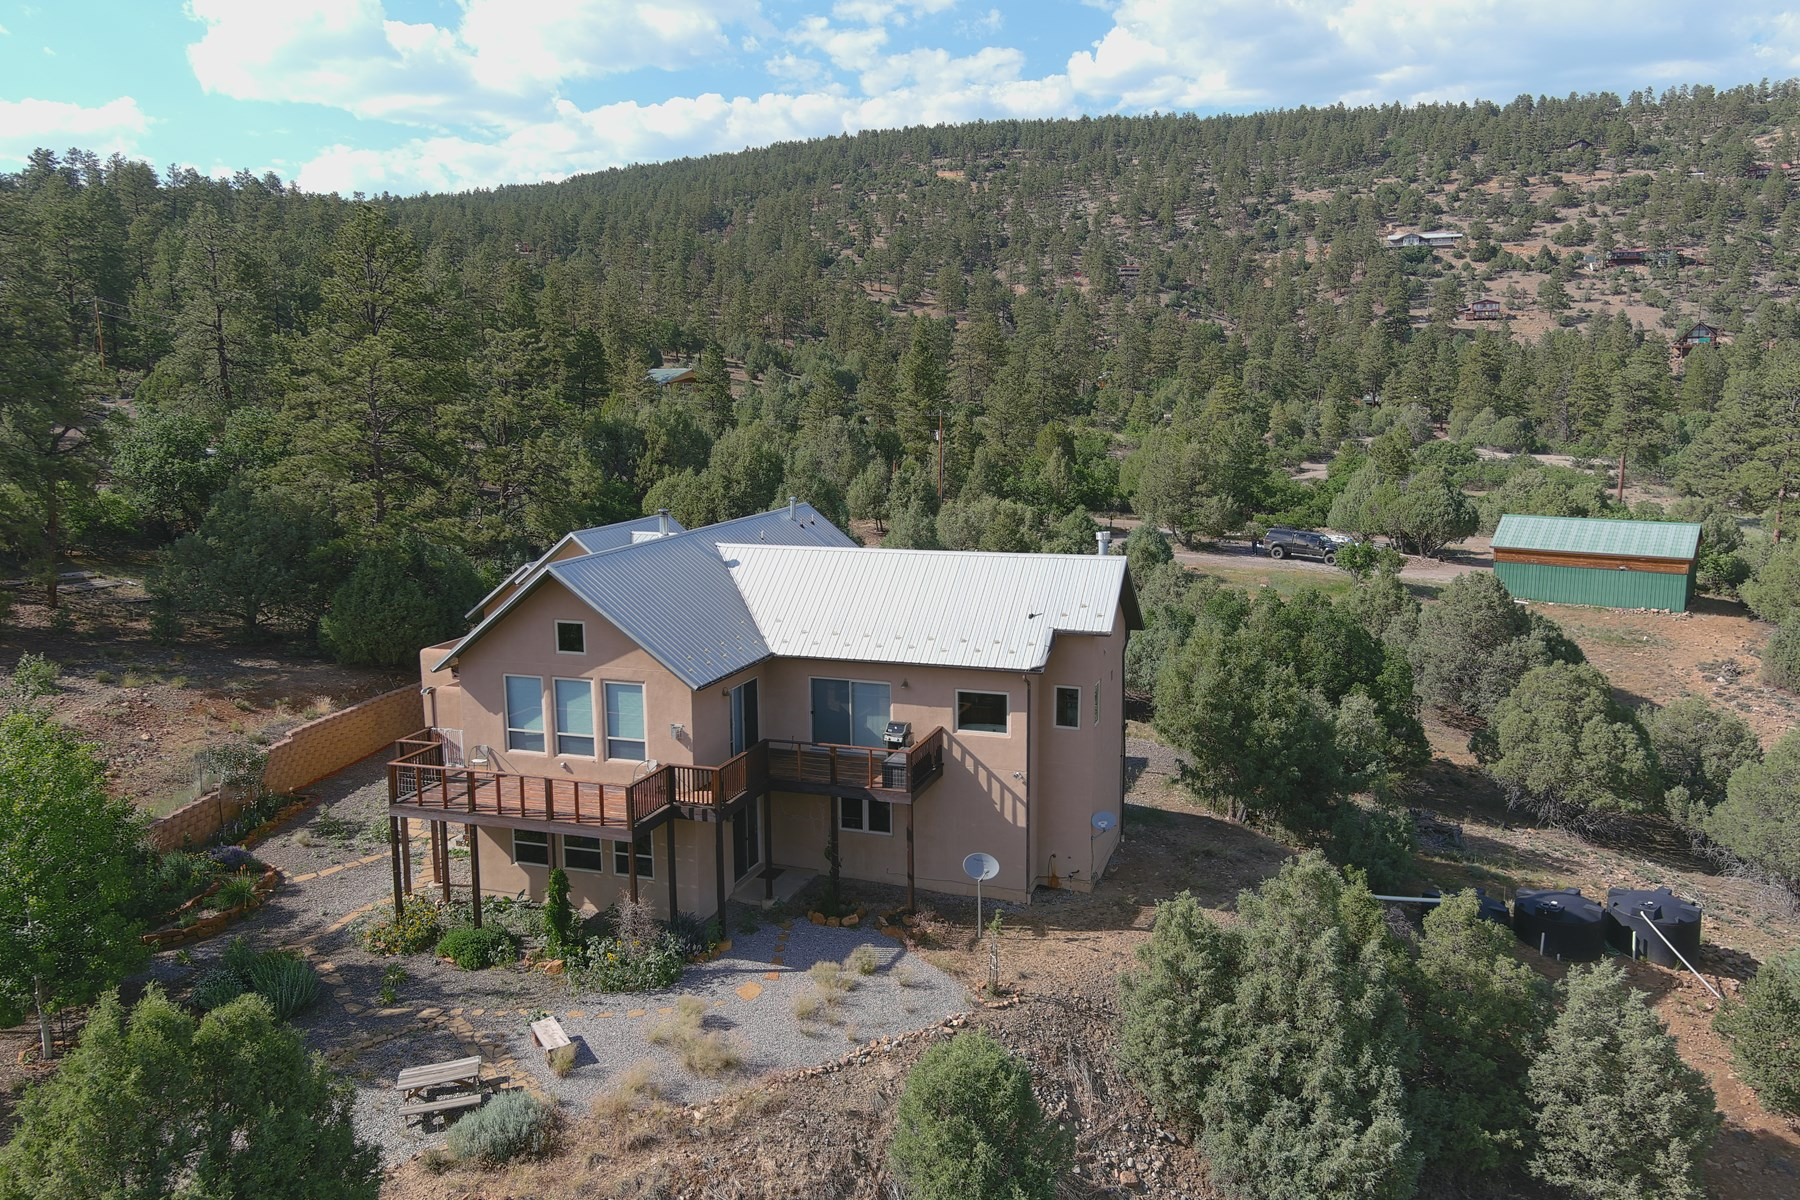 Heron Lake Luxury Home for Sale Near Chama NM Laguna Vista